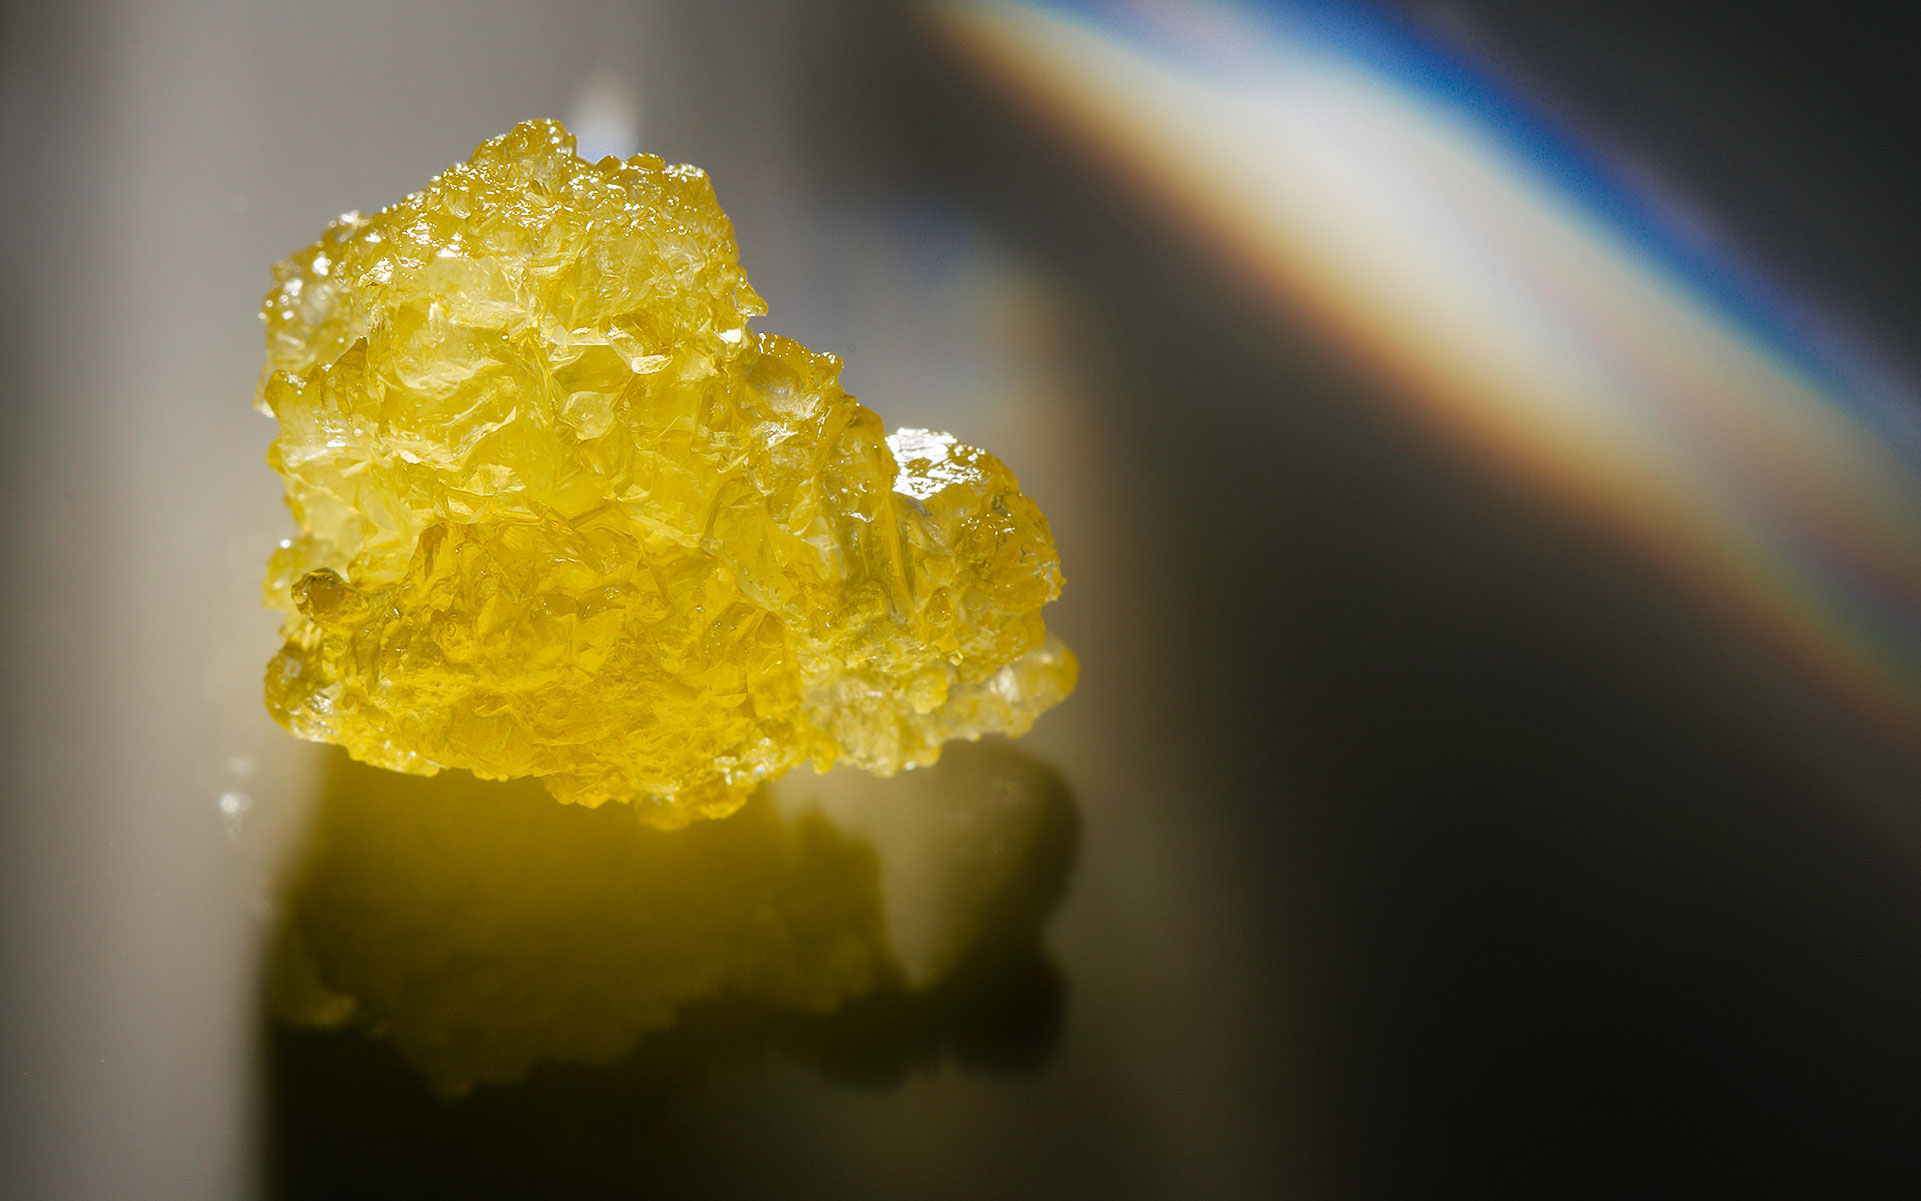 isolate, thca, diamonds, crystalline cbd, extraction, cannabis concentrate, marijuana concentrate